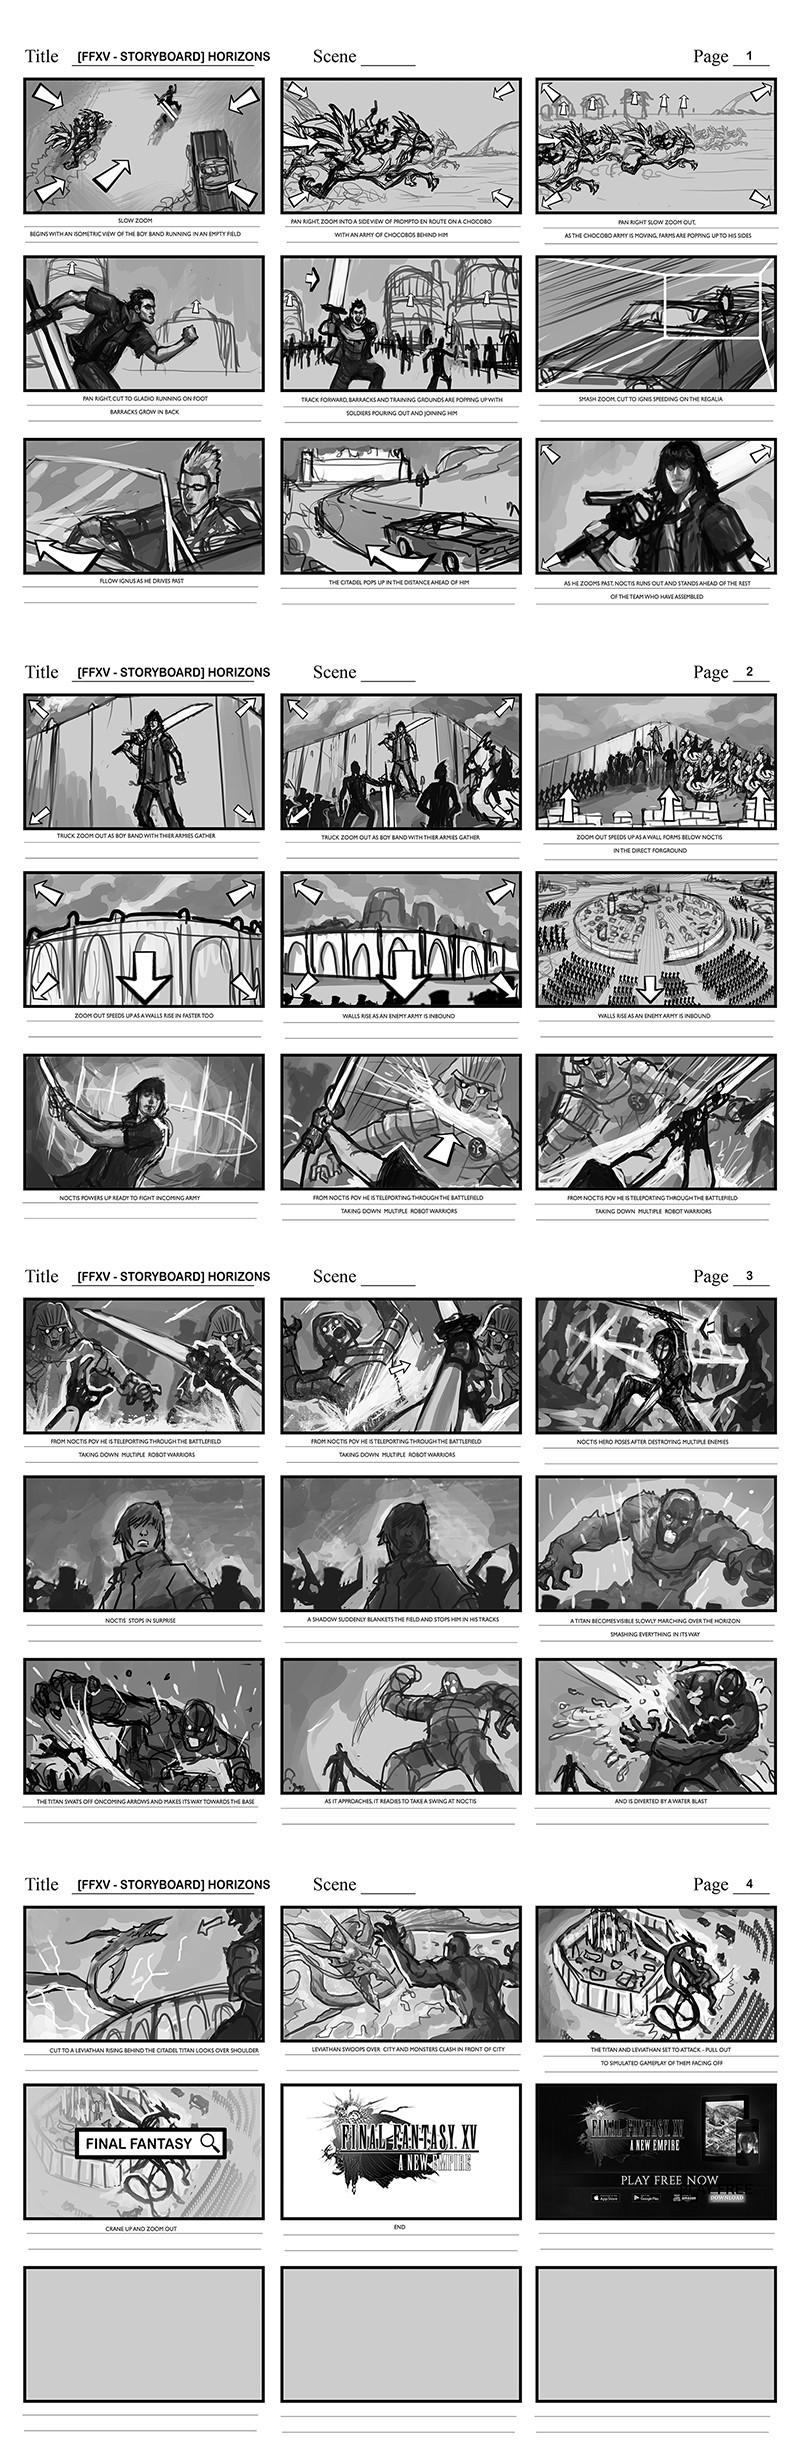 Efrem palacios ffxv storyboard horizons60sec